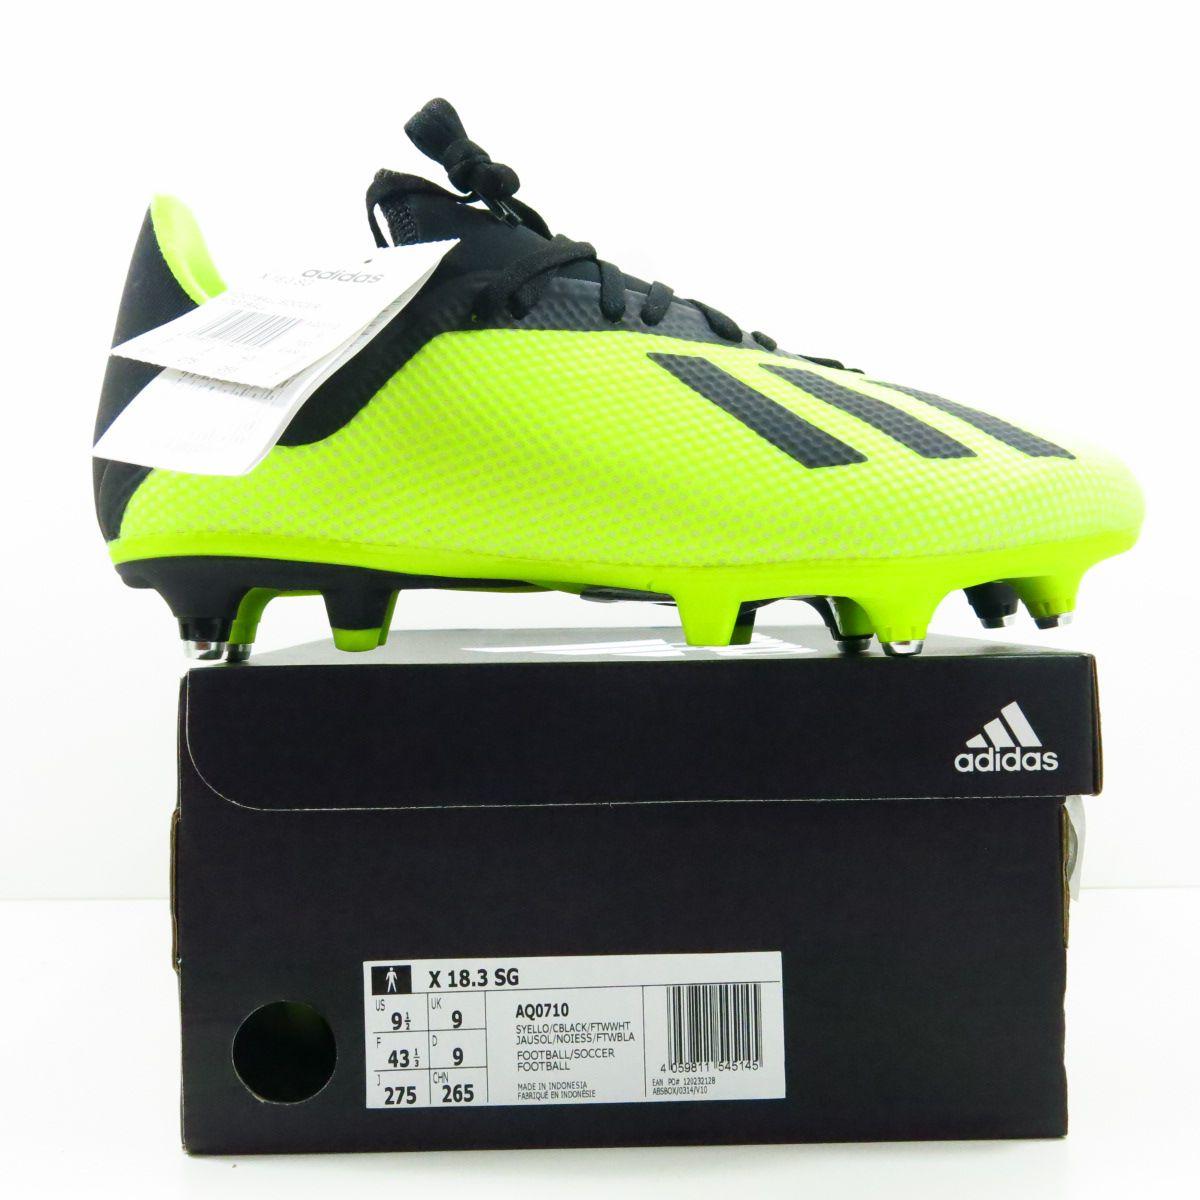 Chuteira Adidas X 18.3 SG - Trava Mista